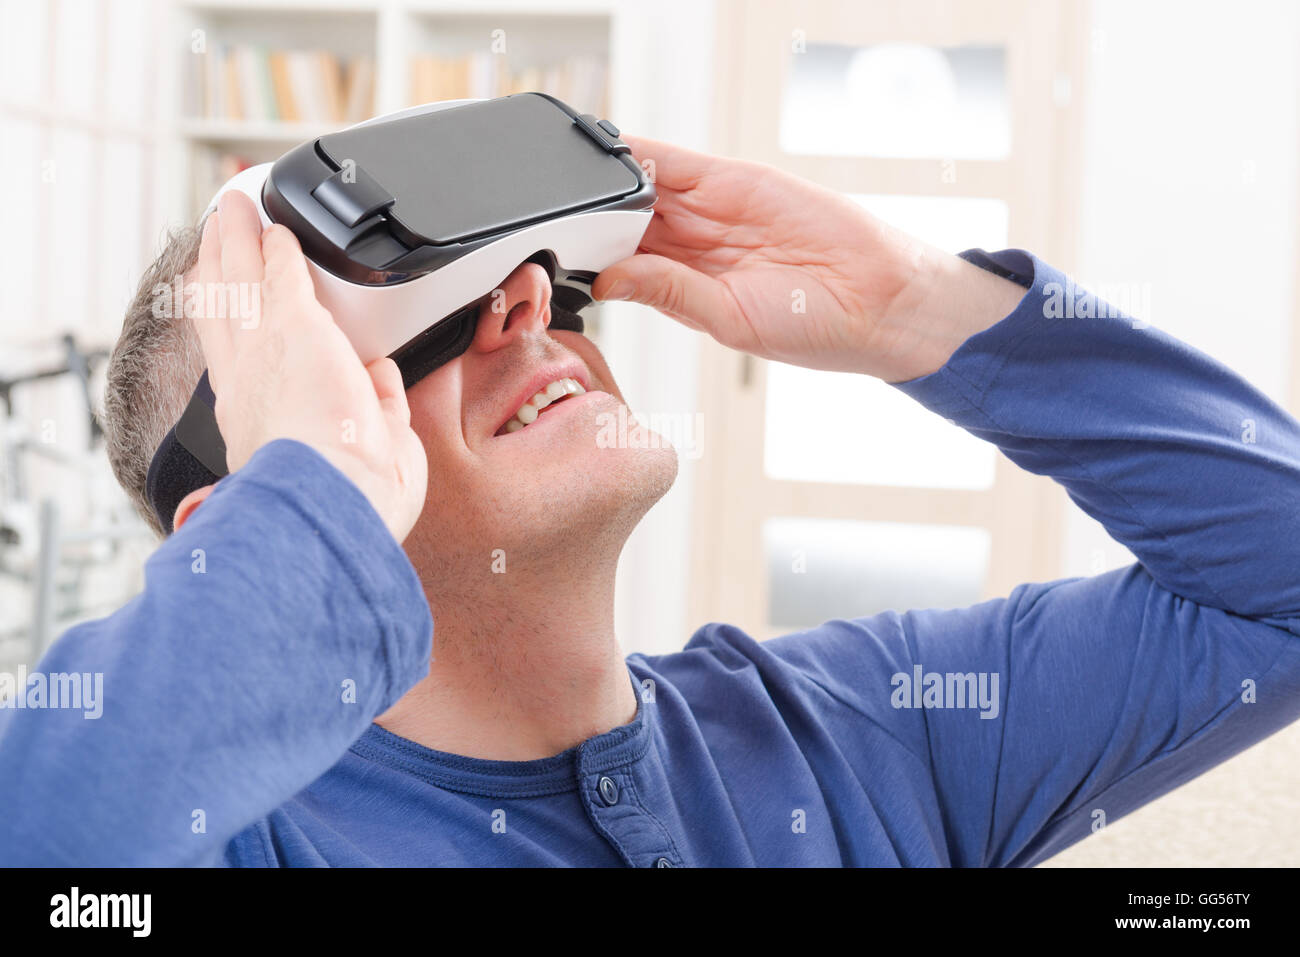 Man using virtual reality headset at home - Stock Image